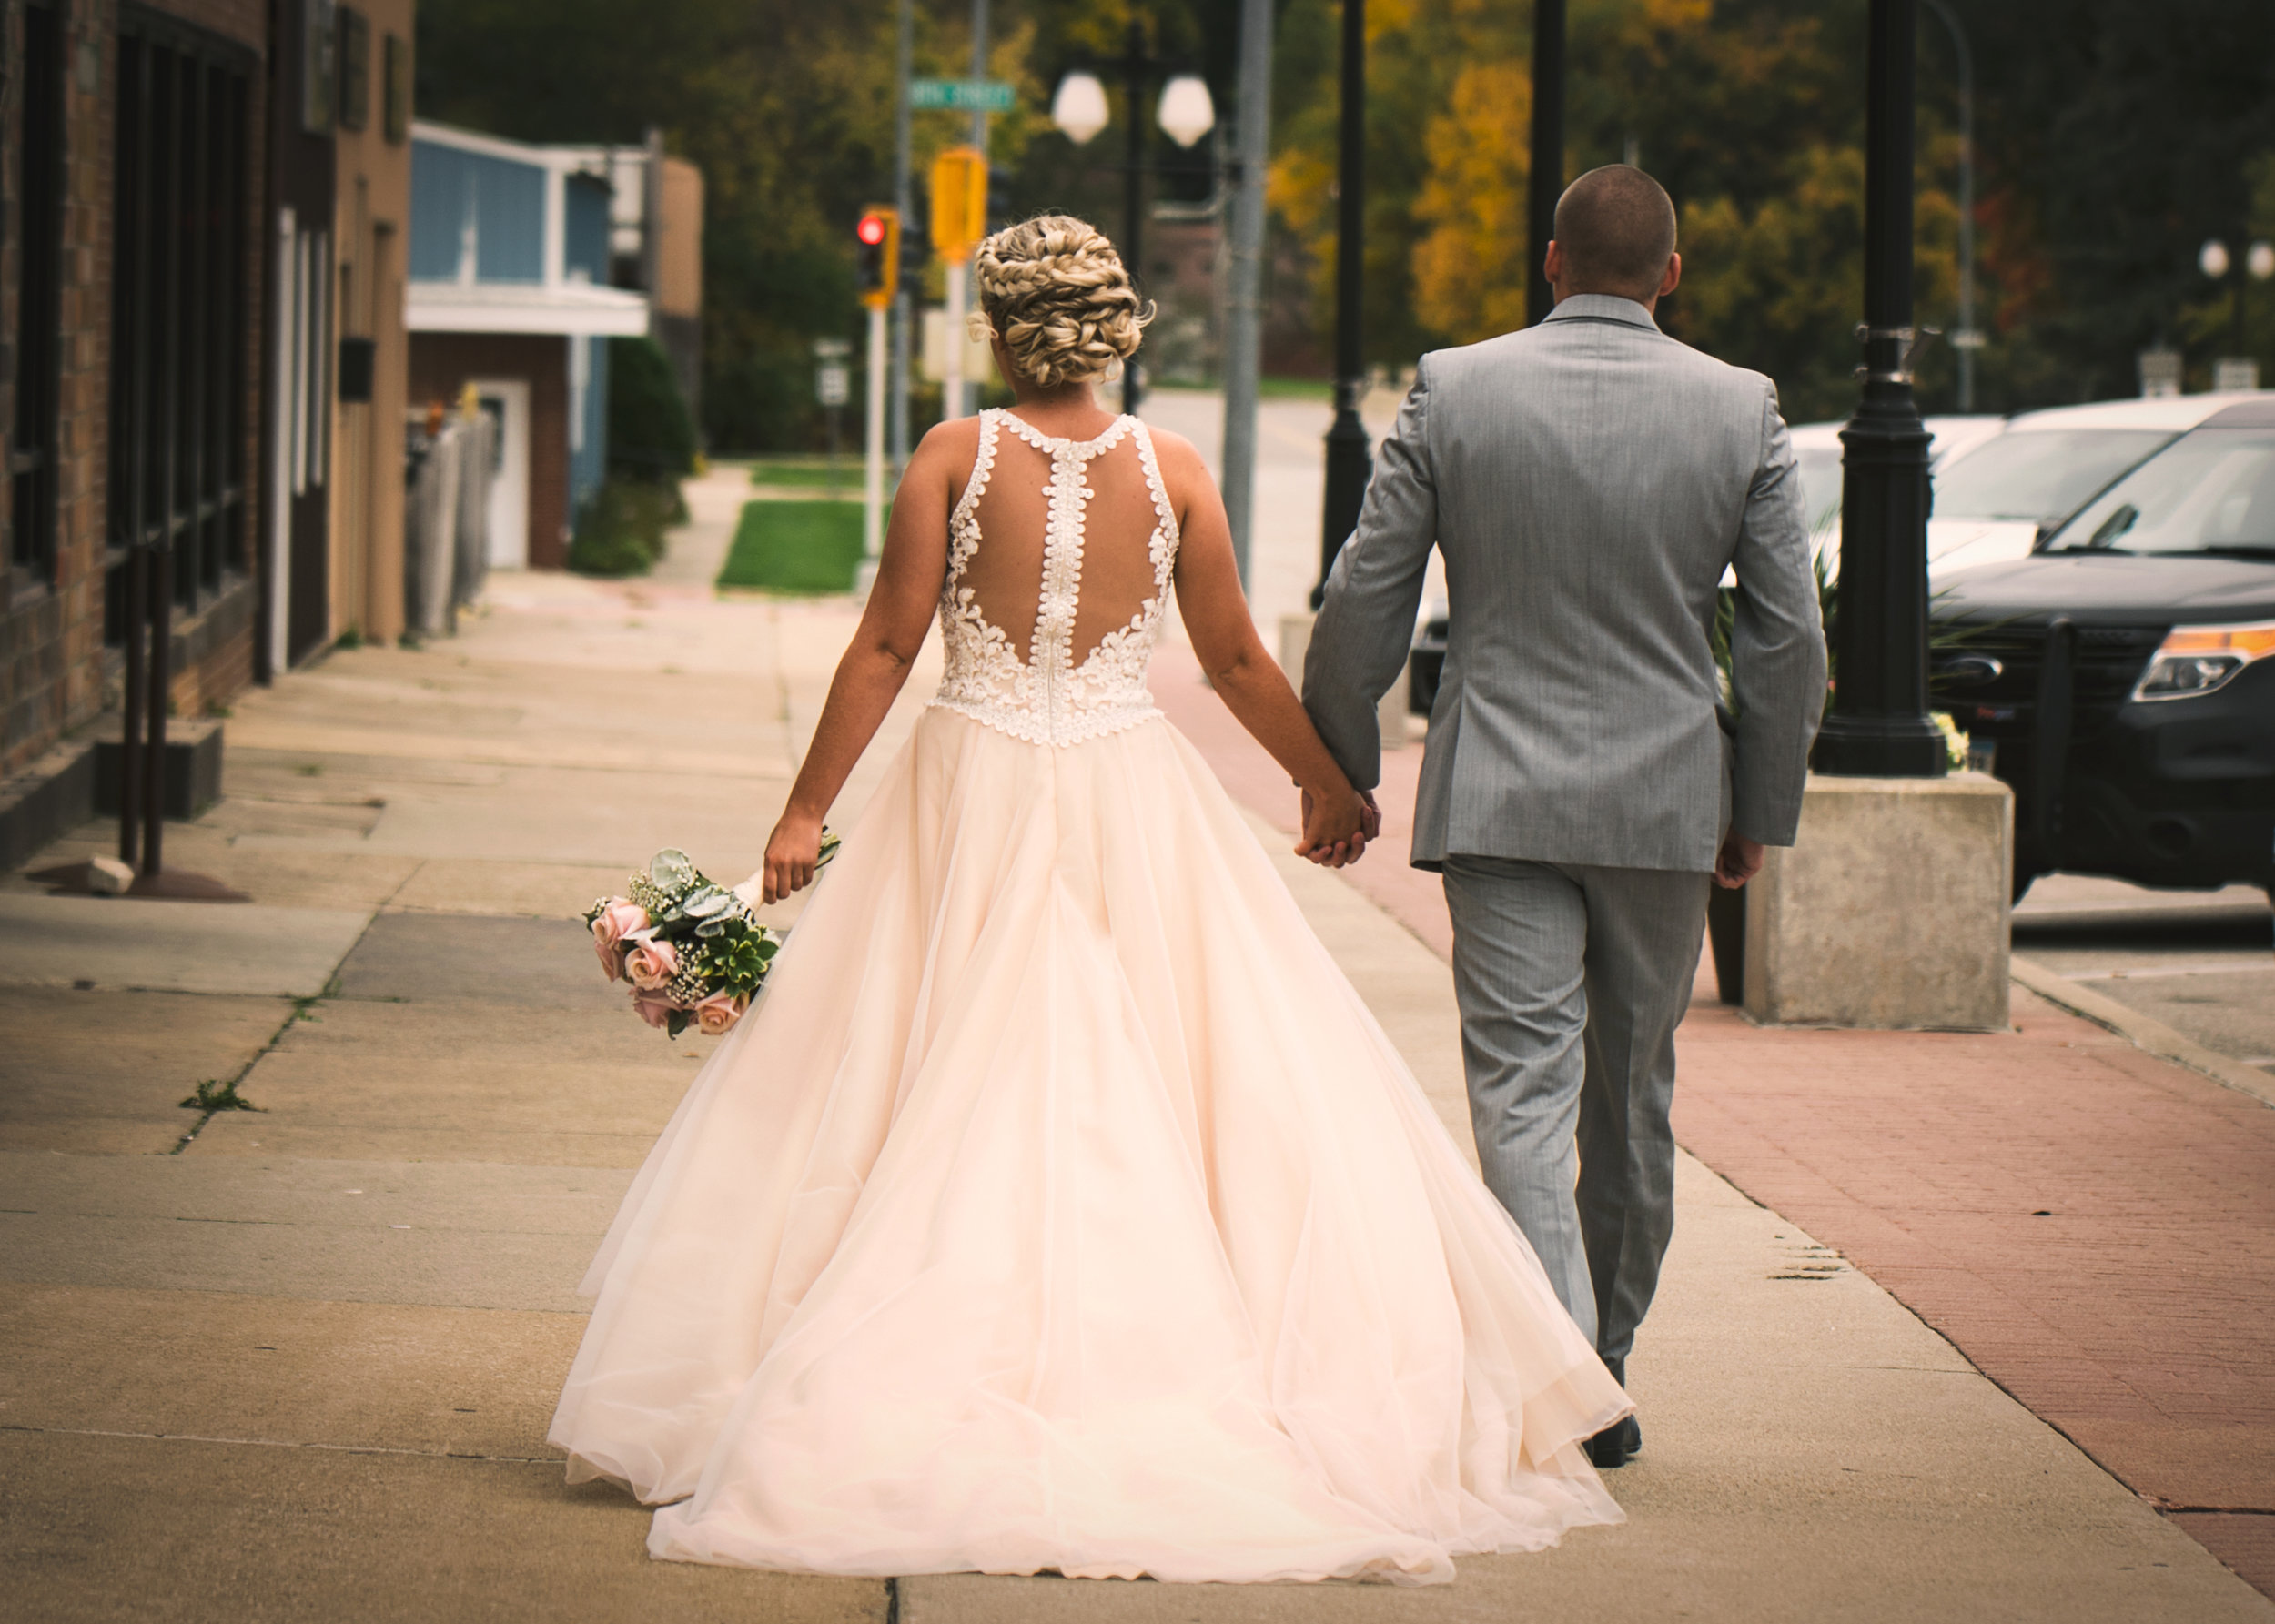 Downtown Humboldt Wedding, Bride and Groom